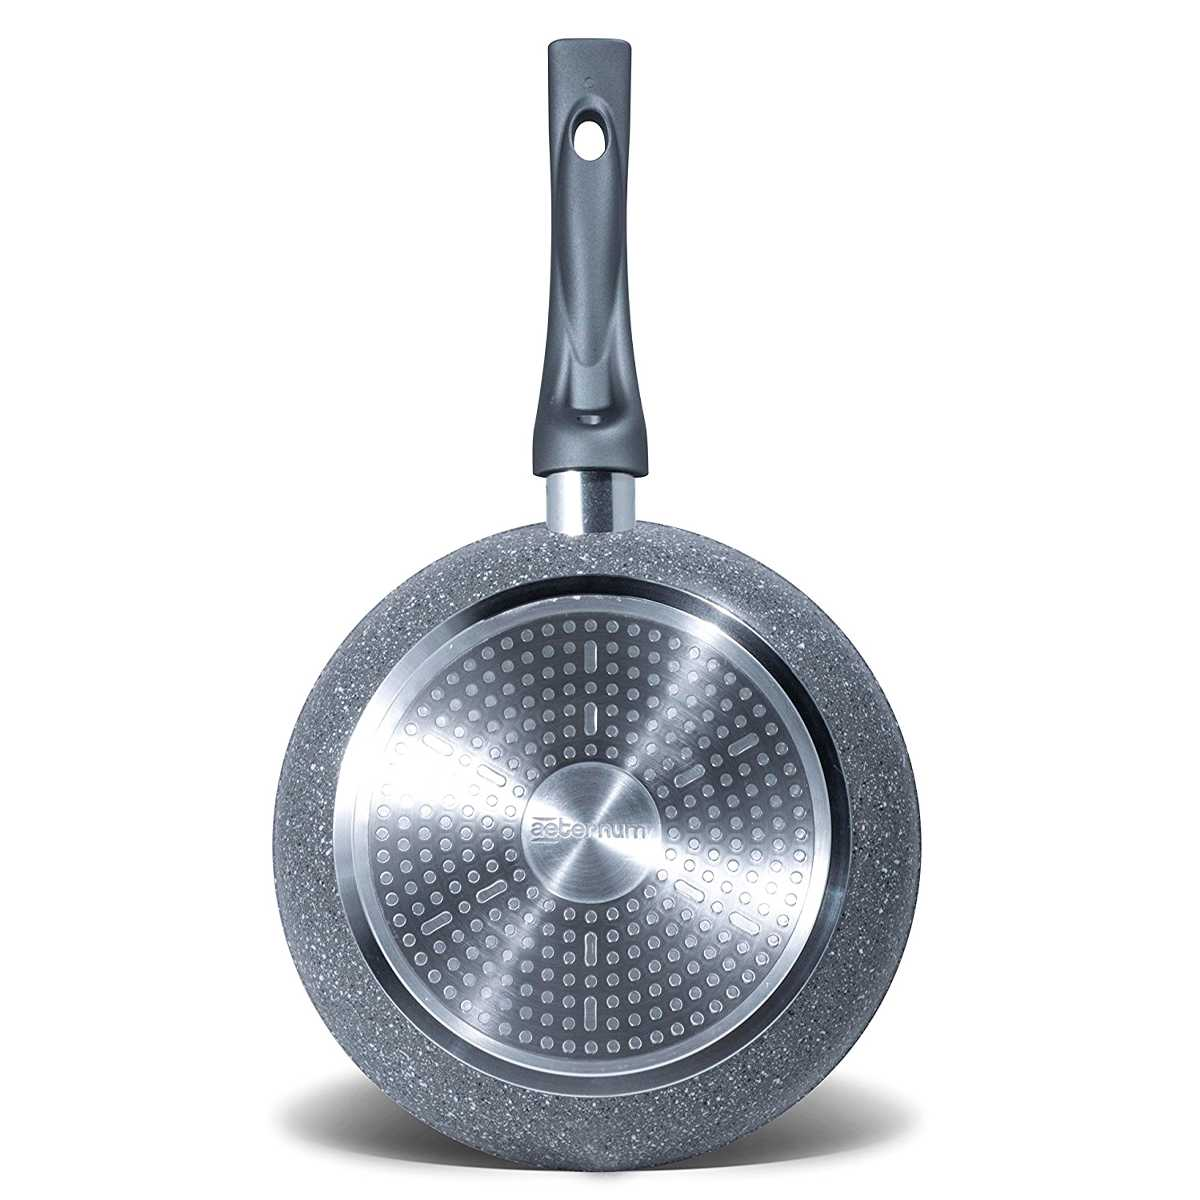 Сковорода для индукционных плит Bialetti MADAME PETRA INDUCTION, диаметр 24 см, серый Bialetti Y0C6PA0240 фото 2